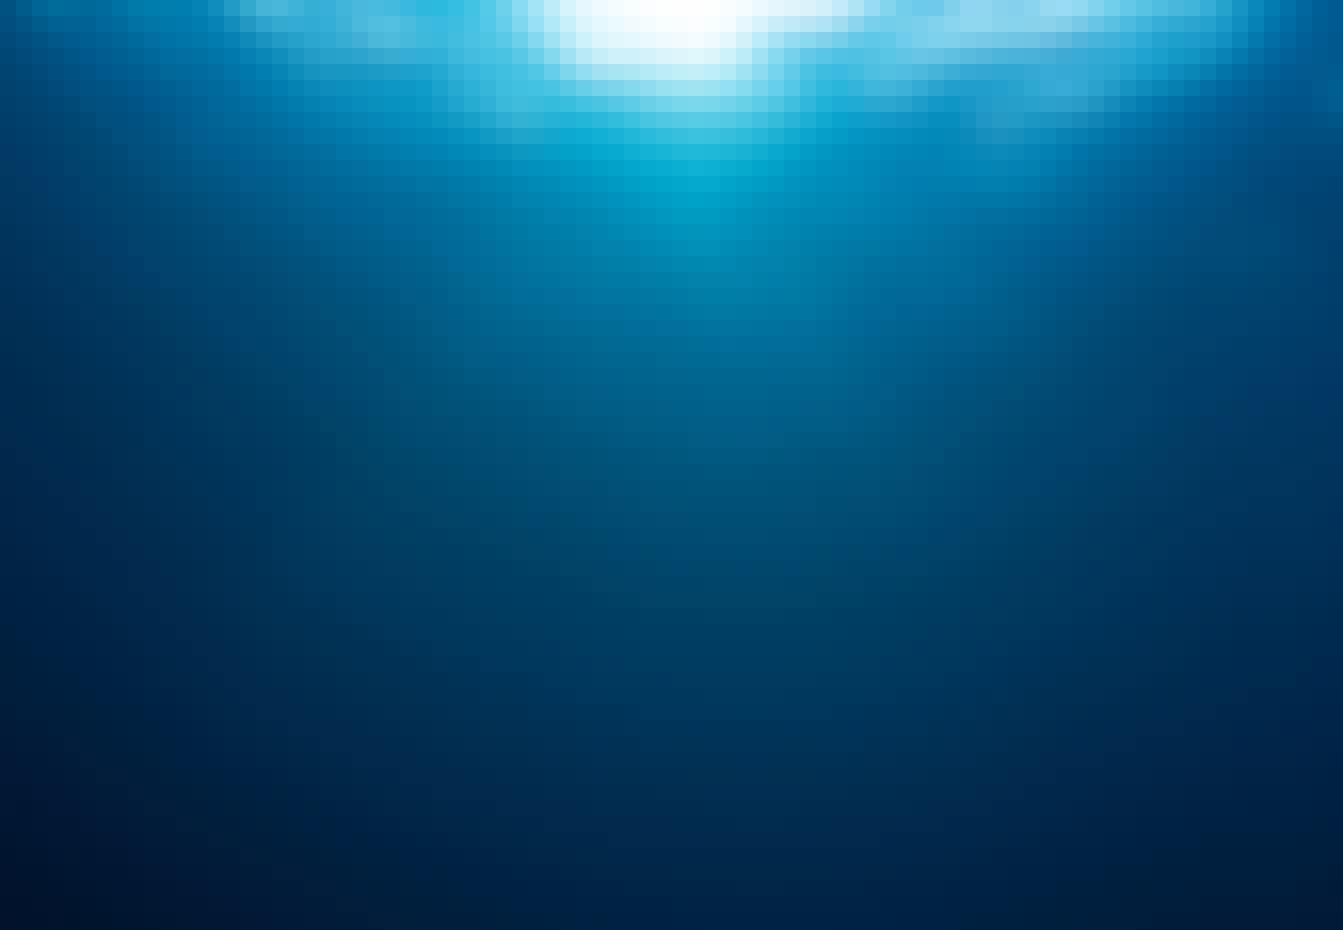 Meri – merien pinnan alla